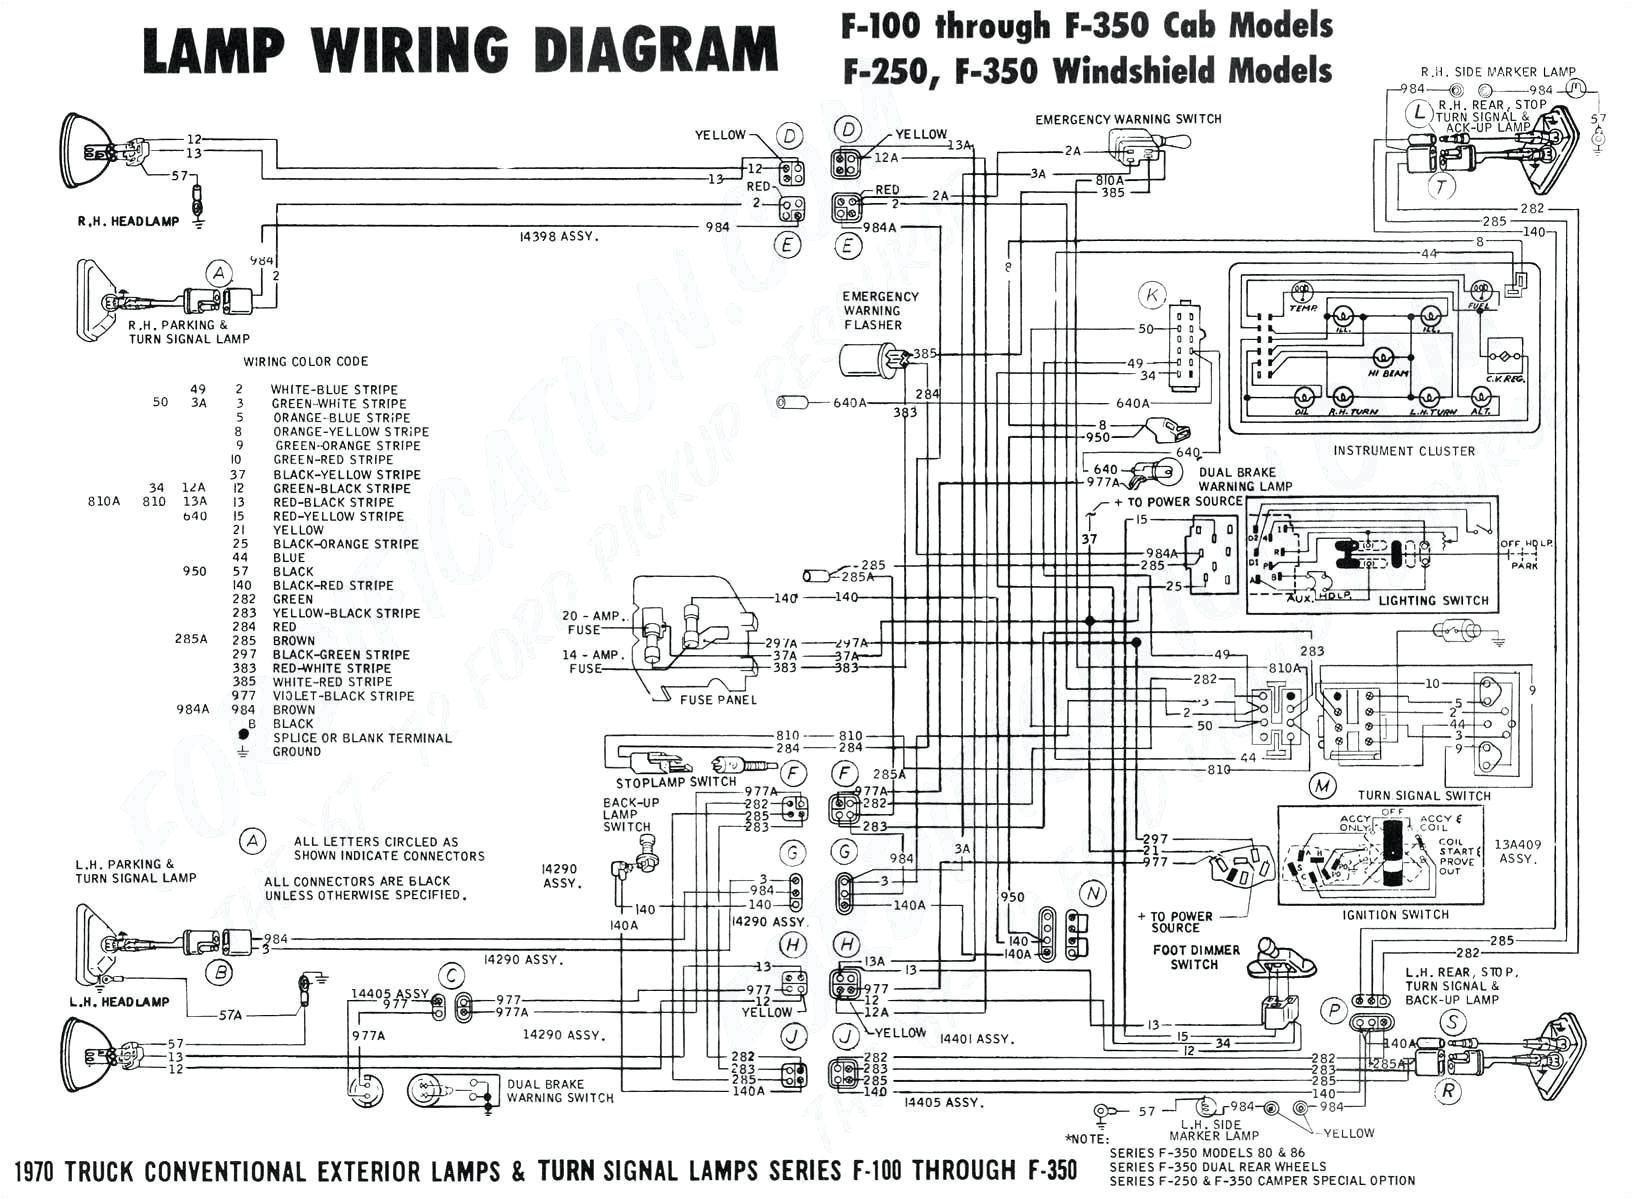 wiring diagrams all years chevette schema diagram database chevy chevette wiring diagram wiring diagram database 03